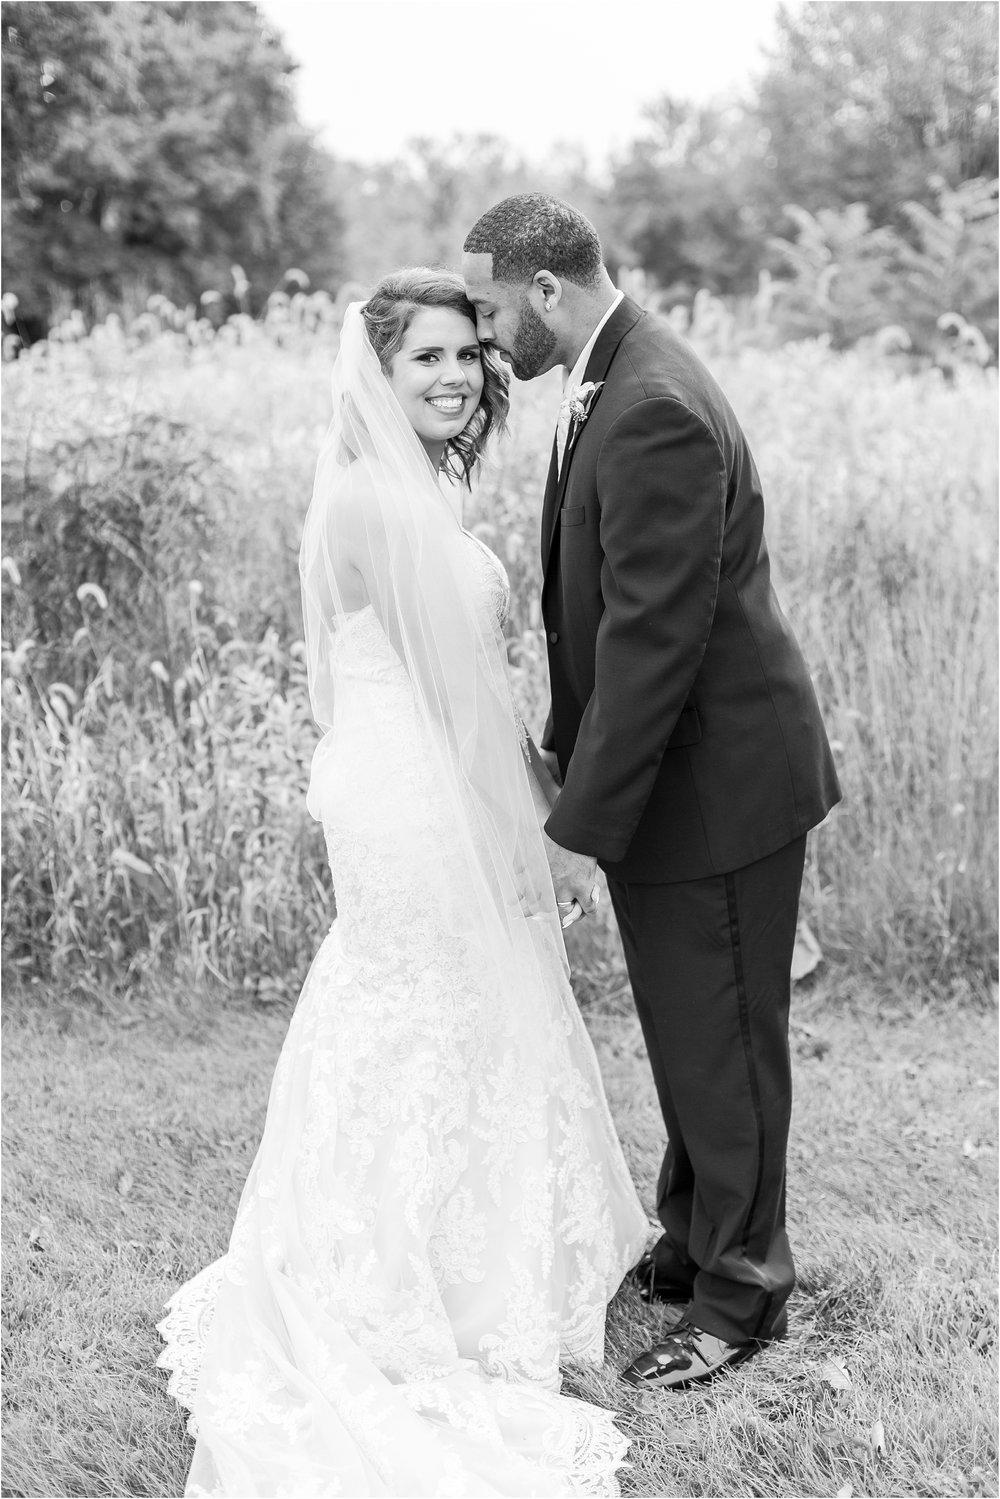 elegant-and-romantic-fall-wedding-photos-at-st-marys-catholic-church-in-monroe-michigan-by-courtney-carolyn-photography_0067.jpg